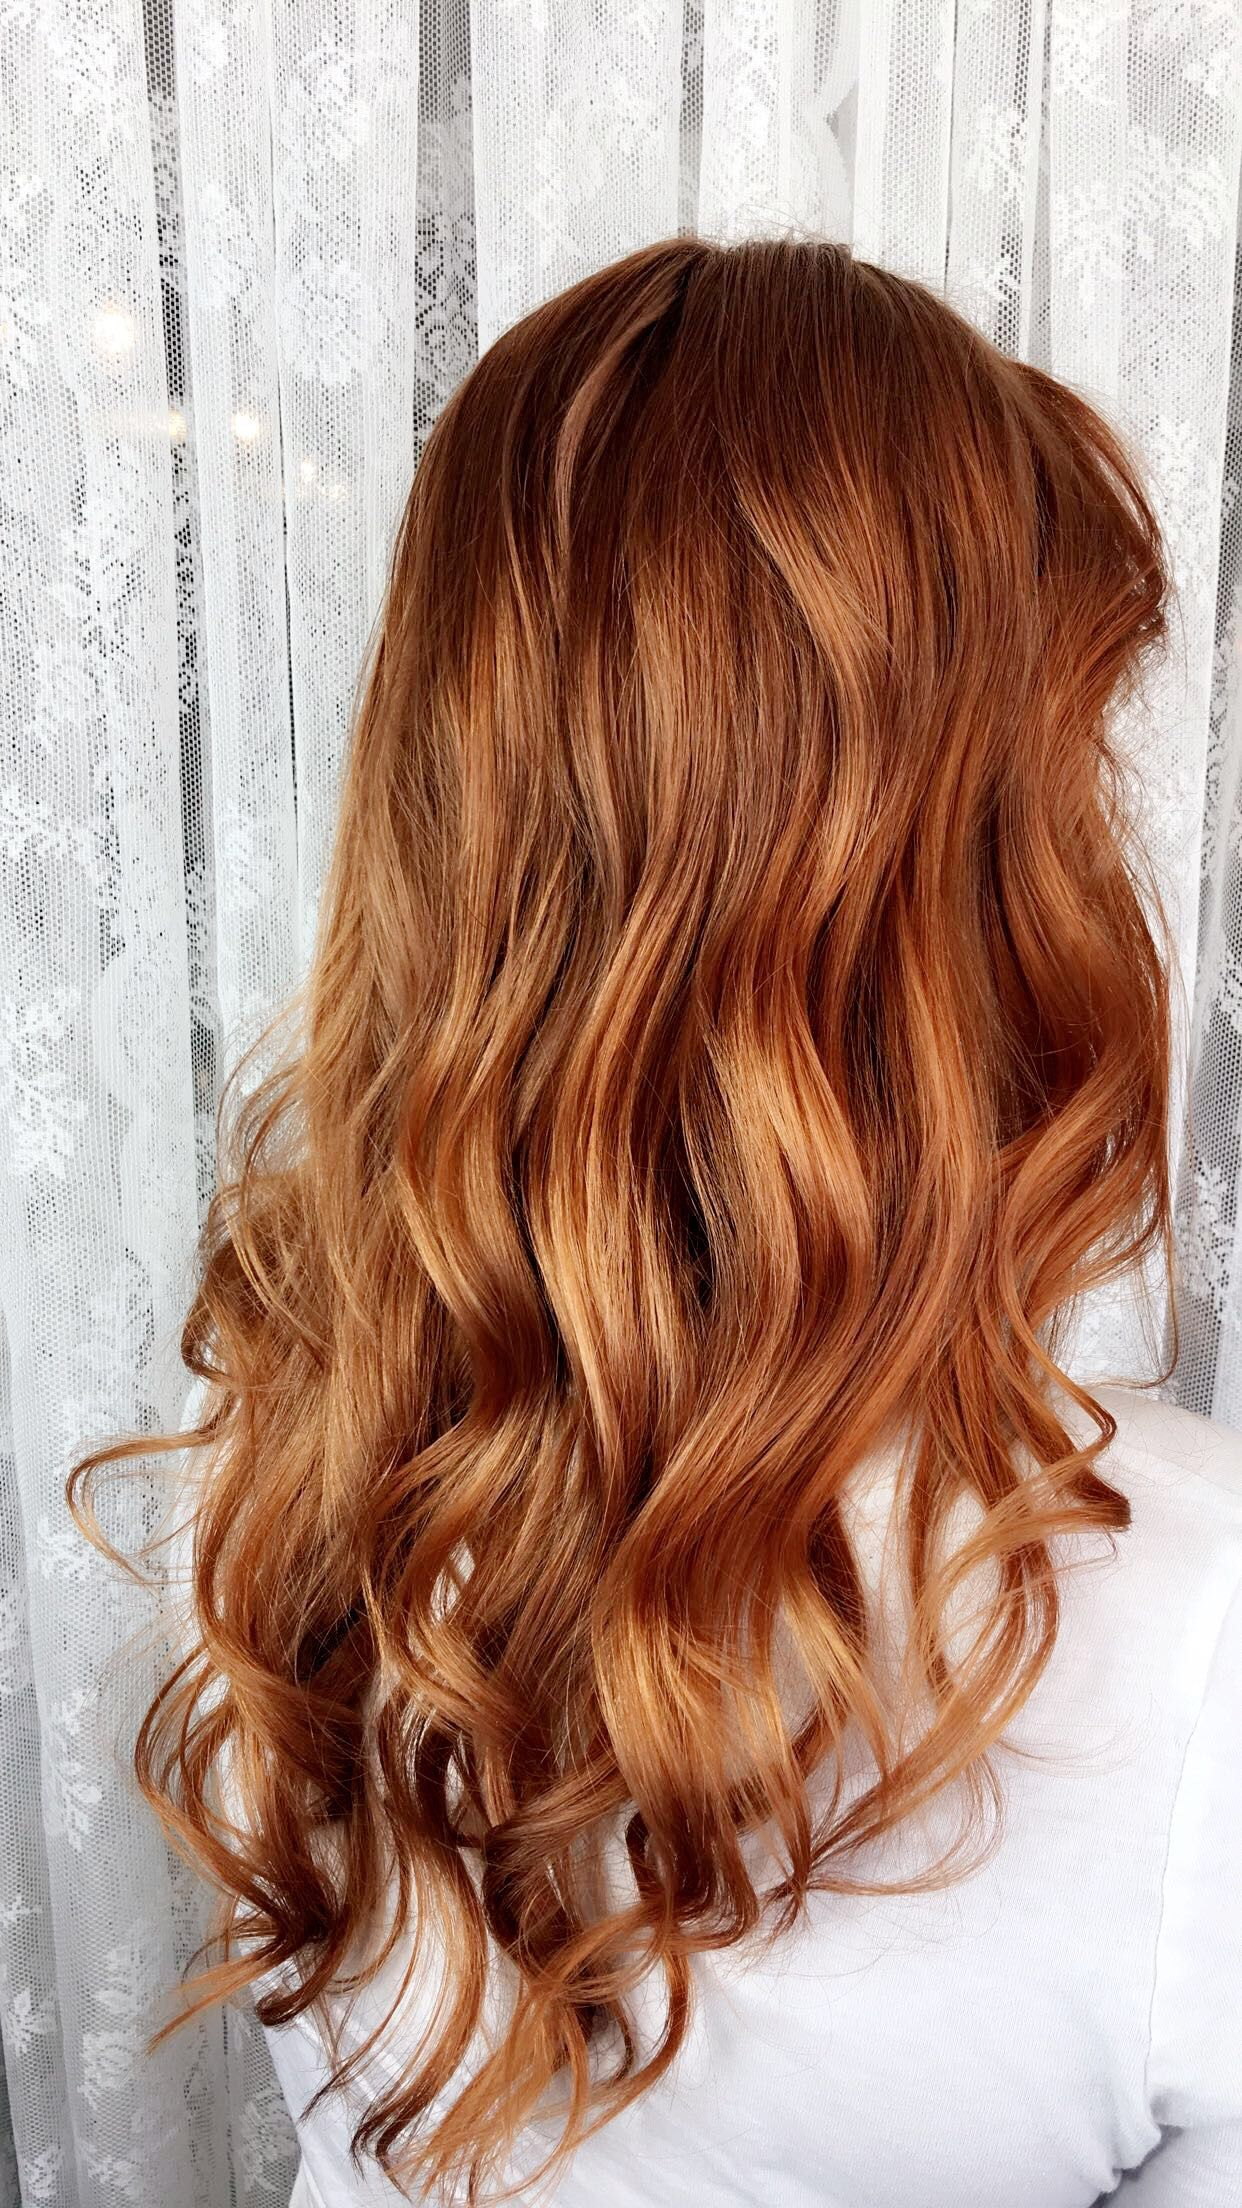 Pin By Blonde Hairstyles On Blonde Hairstyles Medium Pinterest